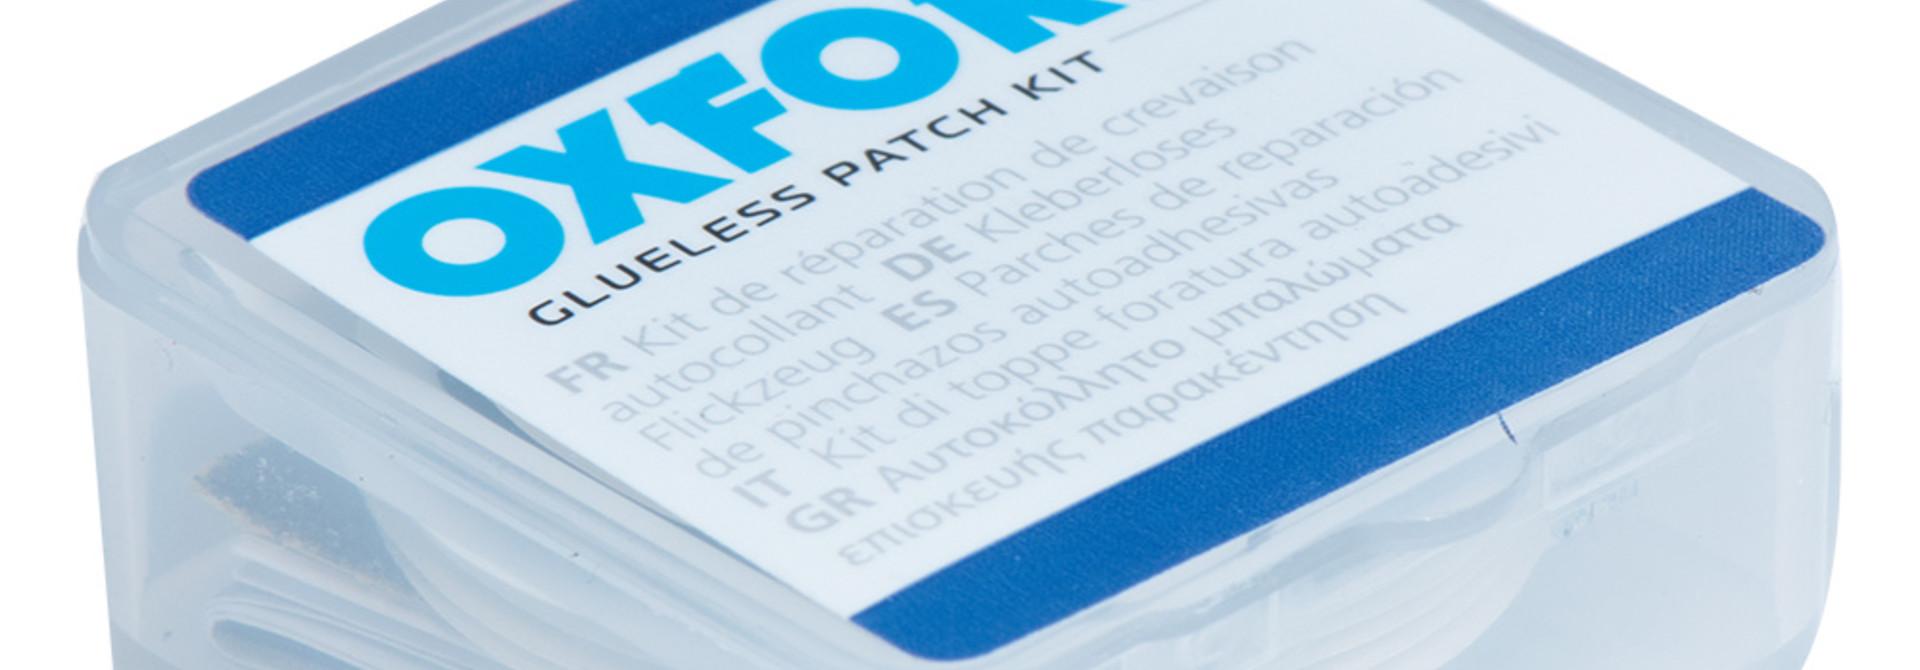 Glueless Patch Kit